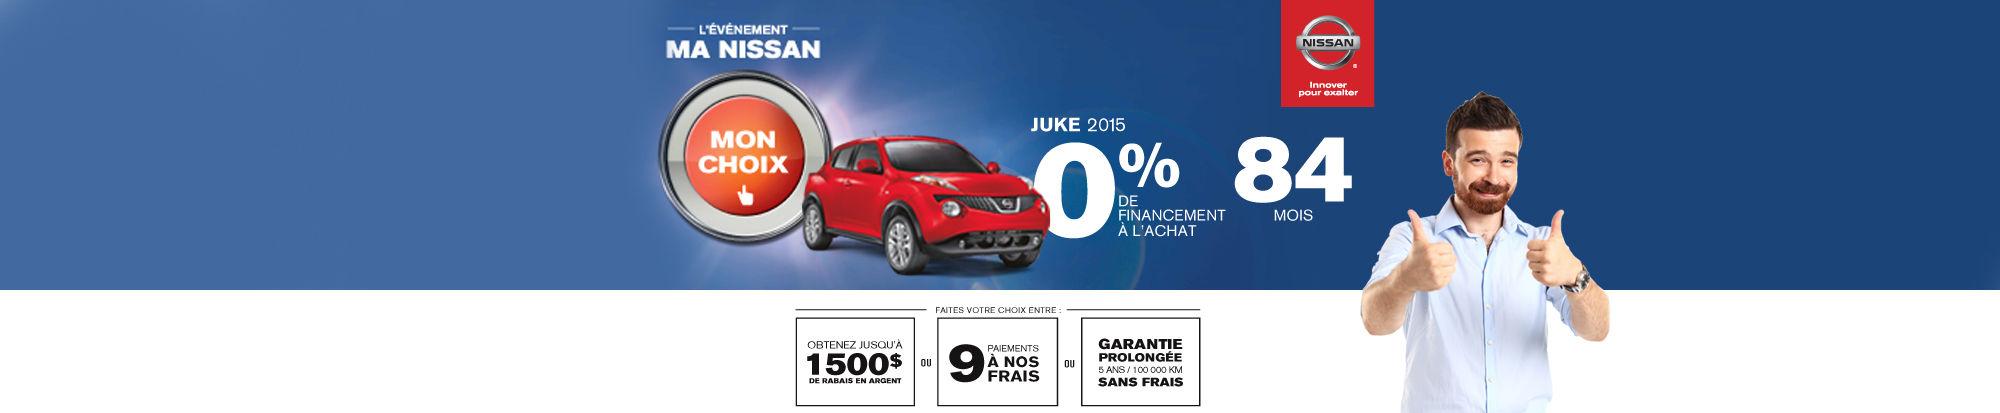 Nissan Juke juin